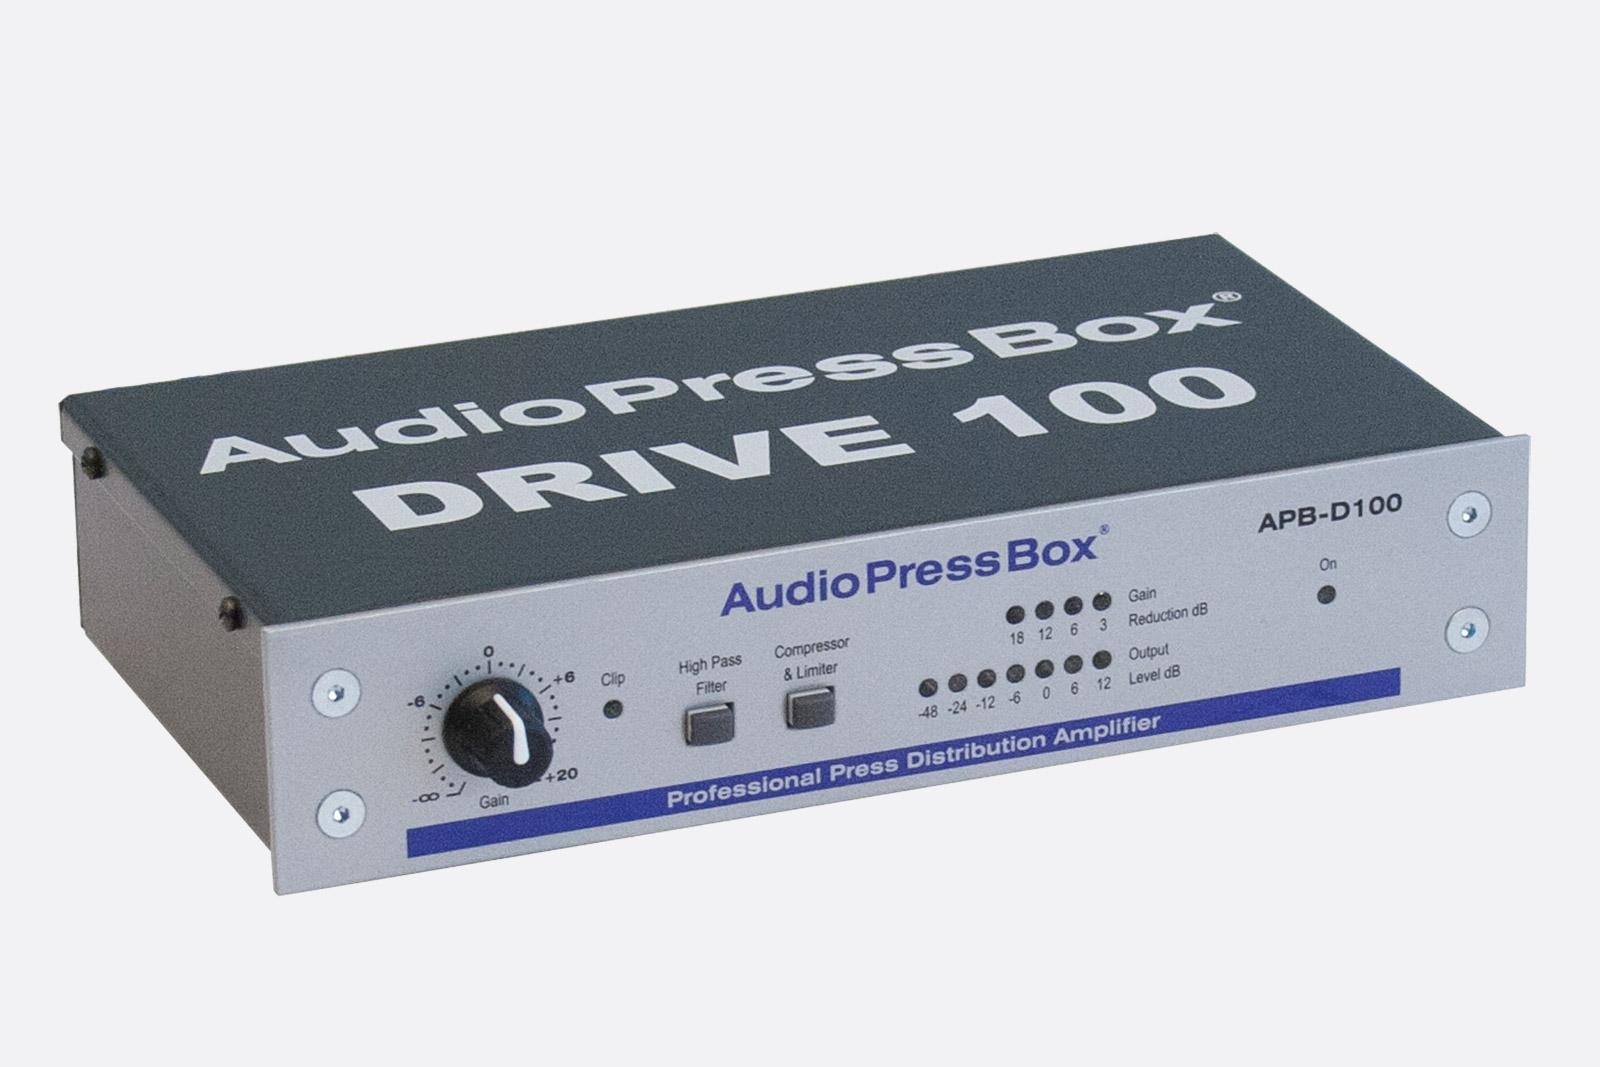 AUDIOPRESSBOX APB-D100 PRESS SPLITTER DRIVE UNIT Active, portable, 1x line  in, 2x Exp  out